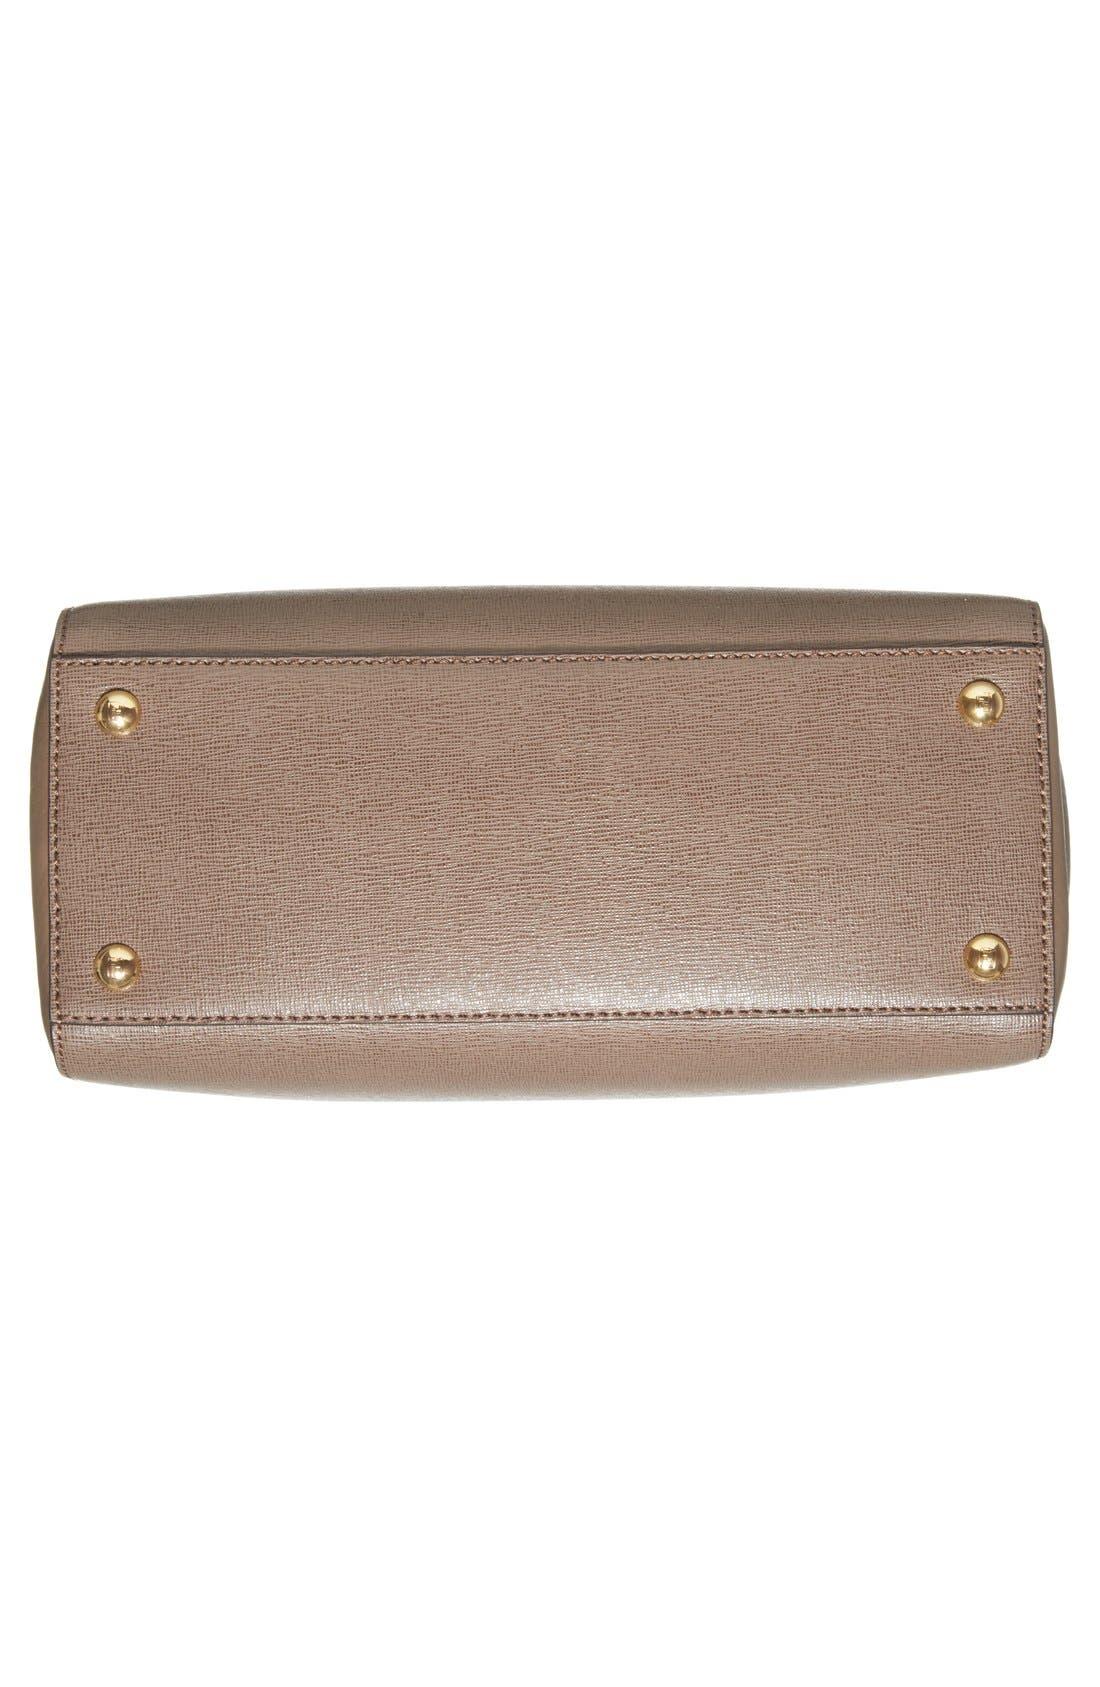 ,                             'Petite 2Jours Elite' Leather Shopper,                             Alternate thumbnail 26, color,                             200